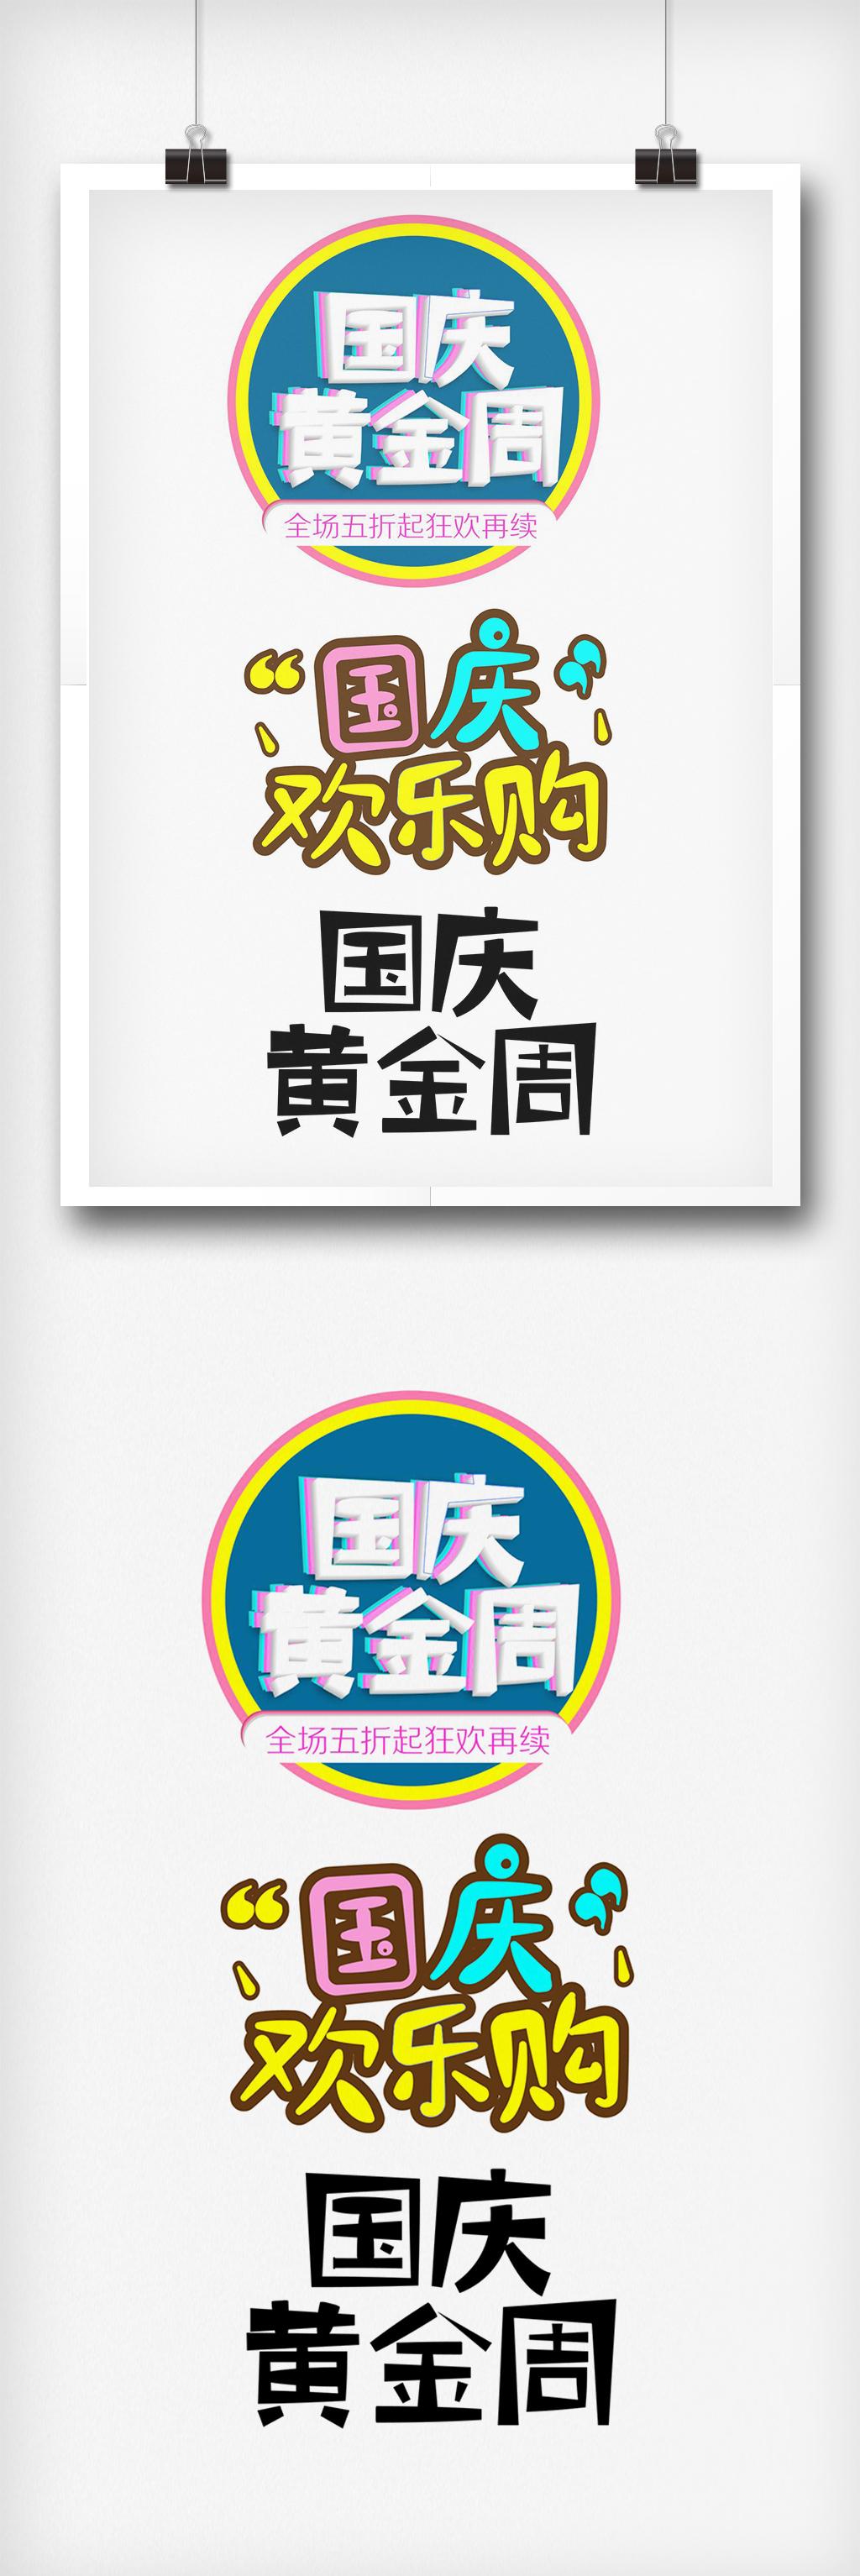 logo logo 标志 设计 图标 1024_3067 竖版 竖屏